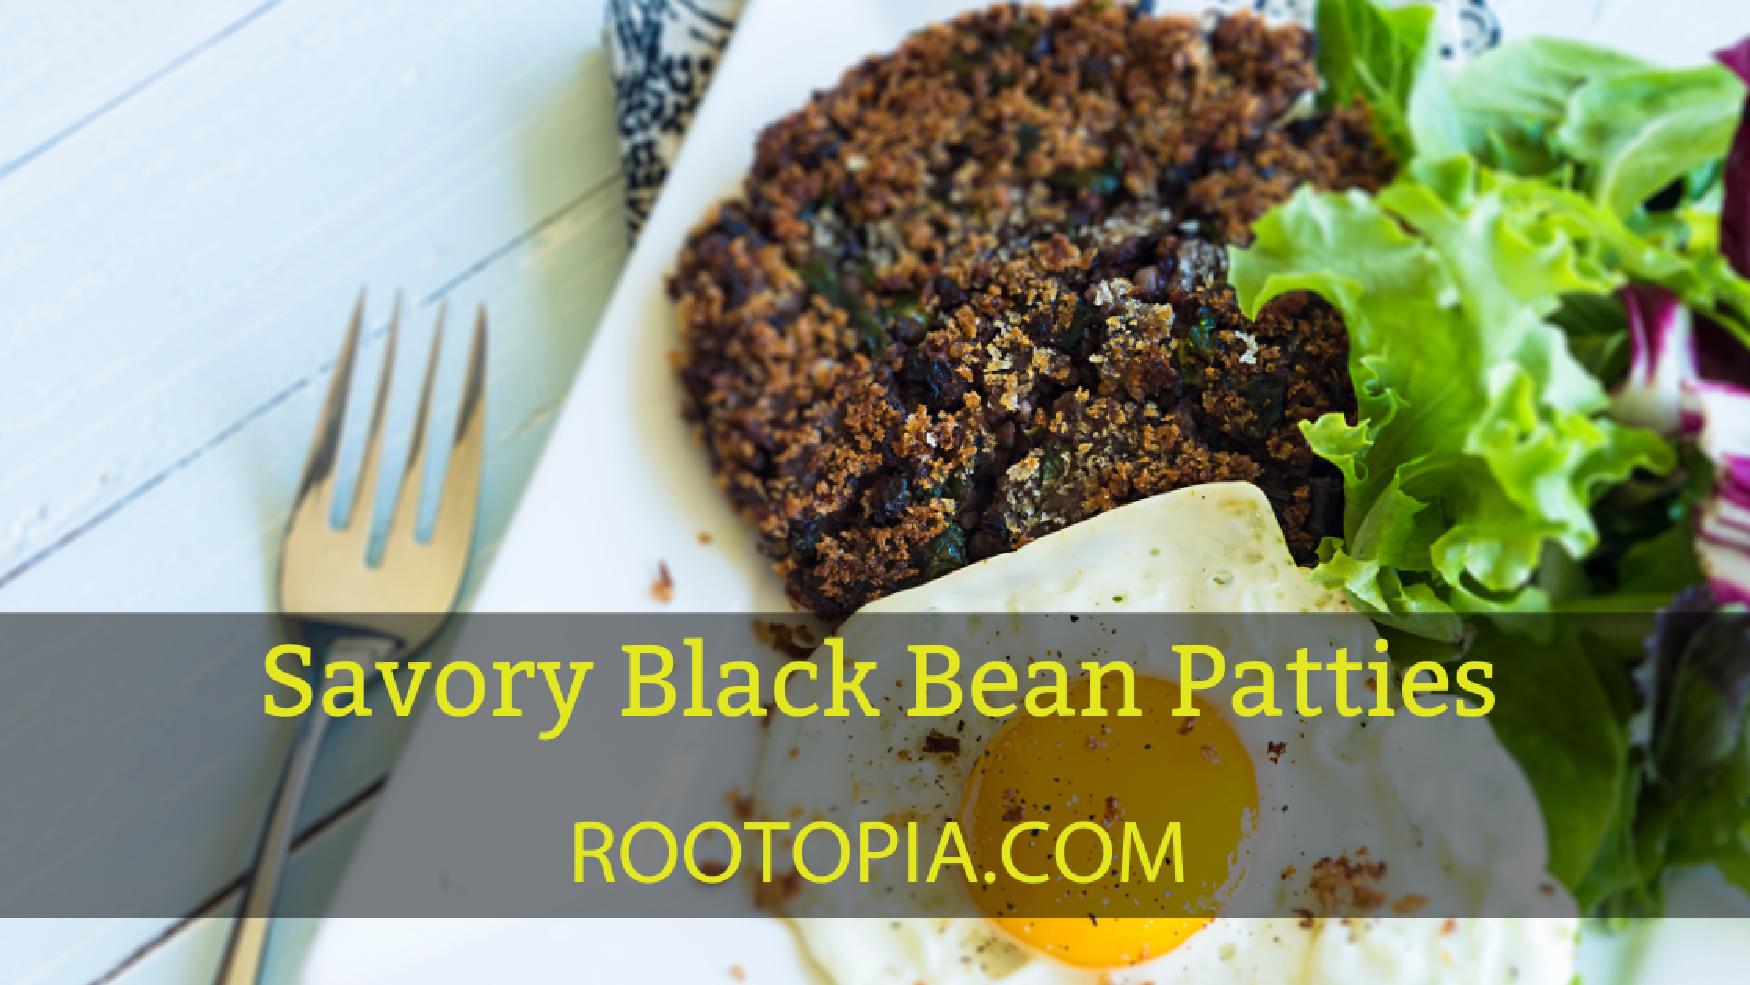 savory-black-bean-patties-blog-post-header-image